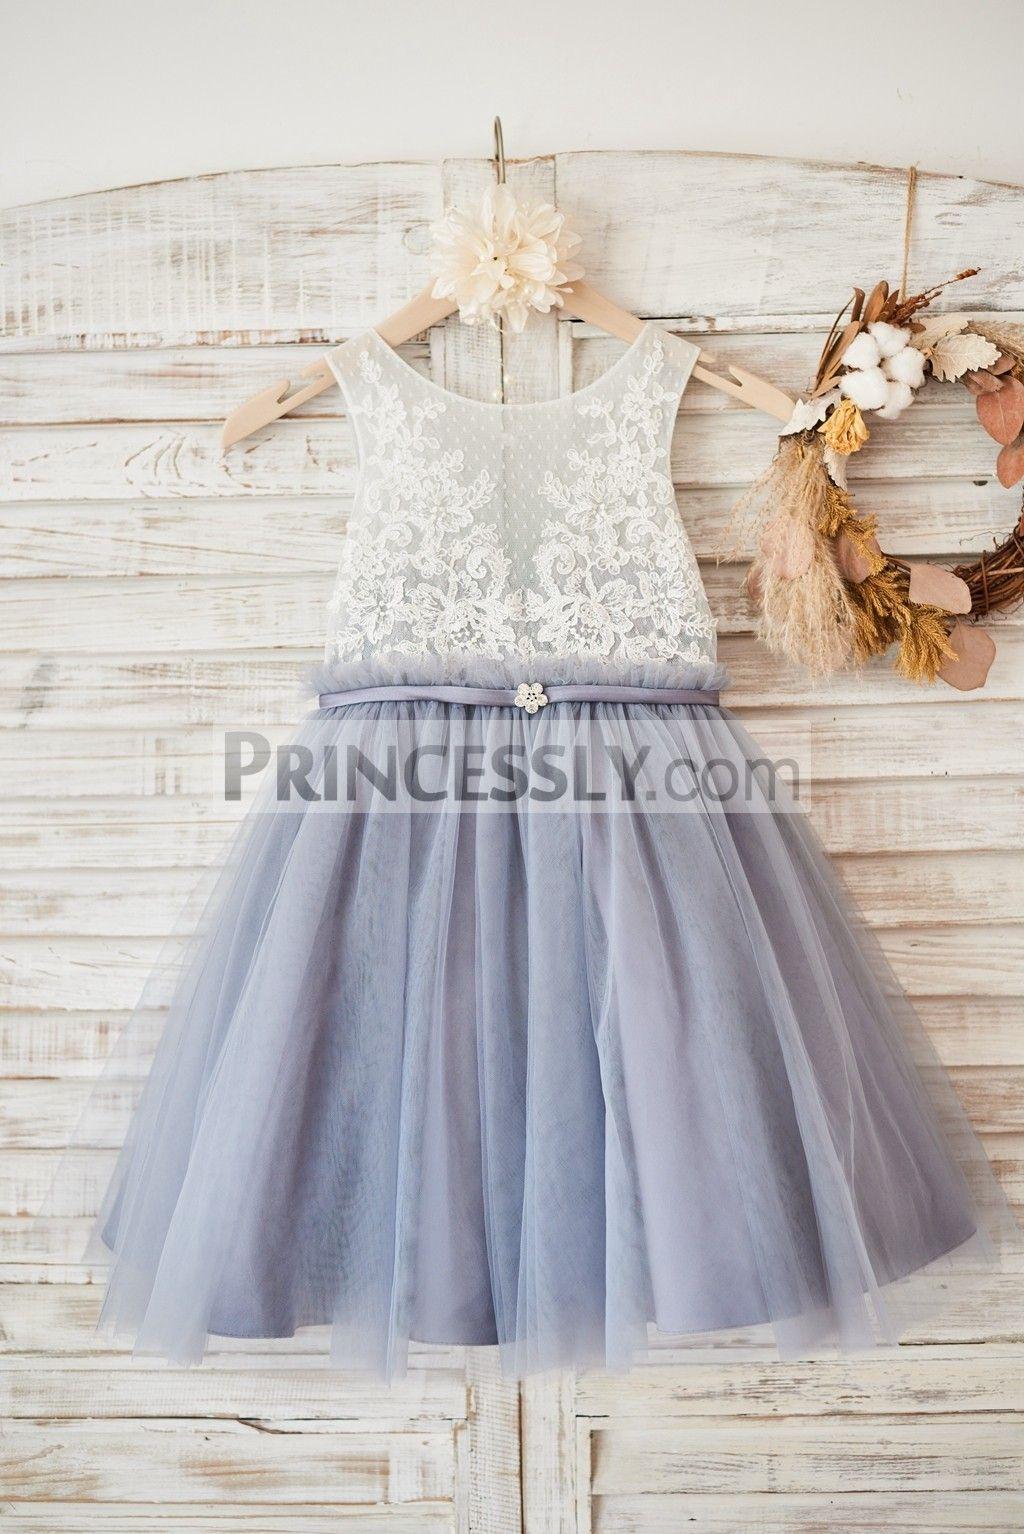 Princessly K1003580 Ivory Lace Dusty Blue Tulle Sheer Back Wedding Flower Dress With Belt 31